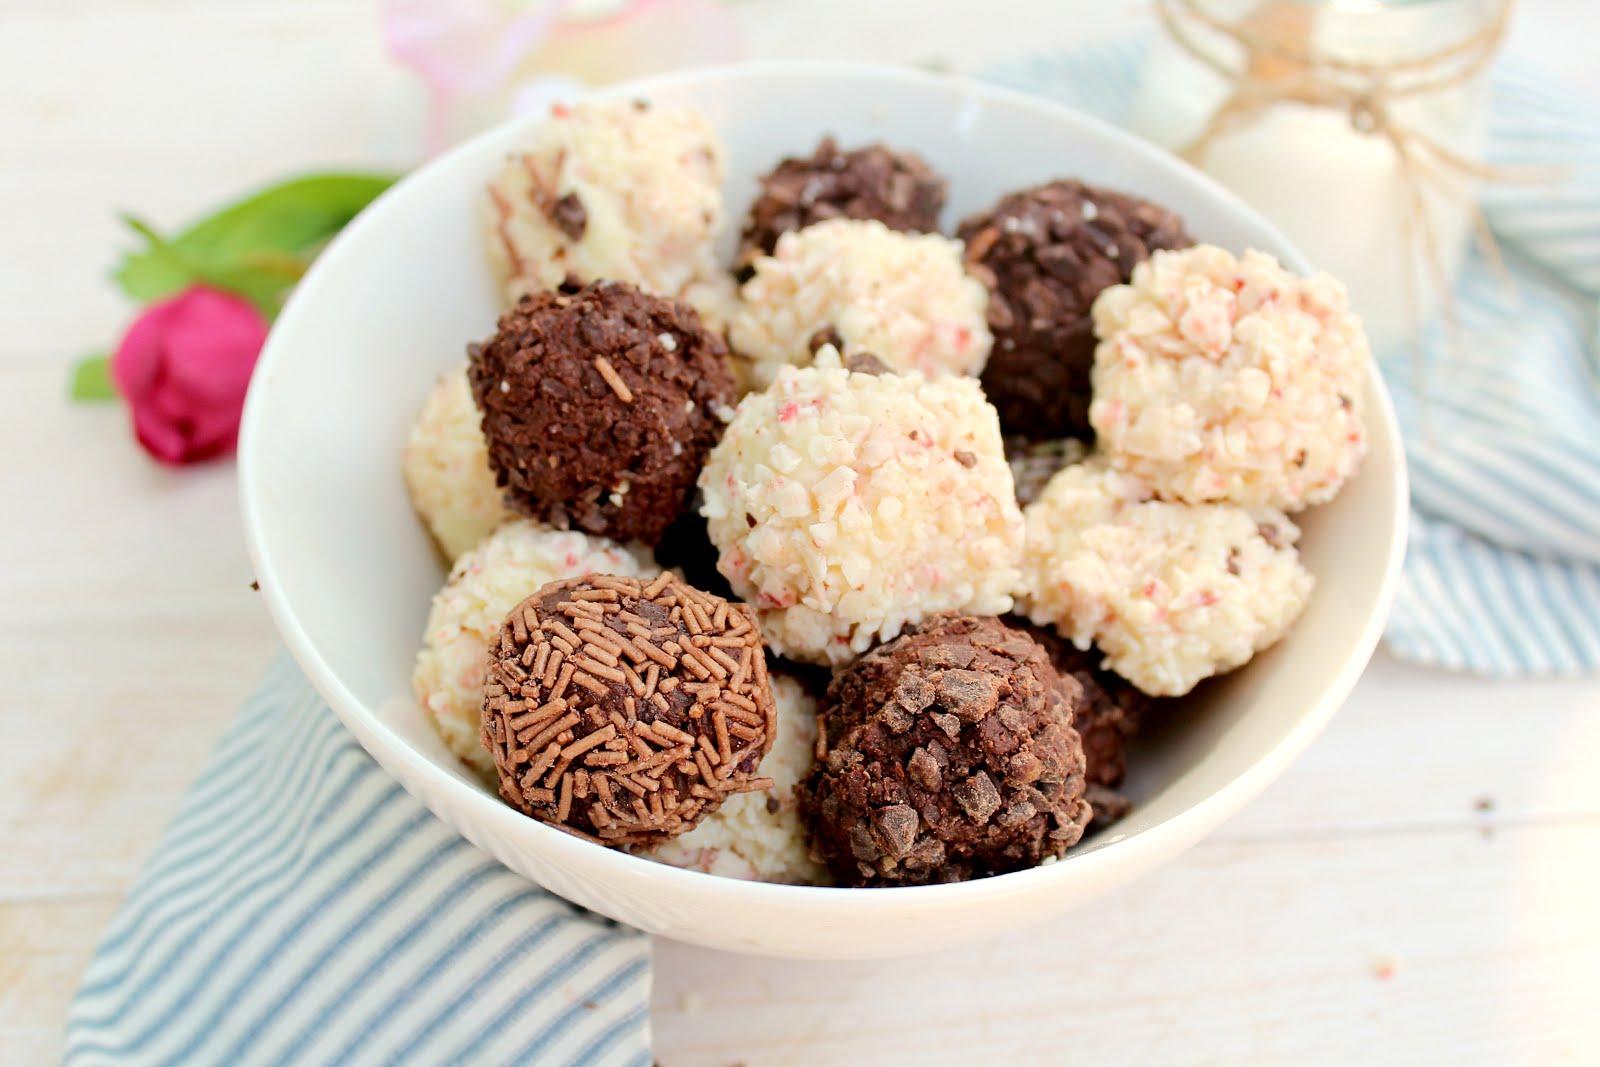 3 Ingredient Greek Yogurt Truffles: much healthier than most versions, and still creamy and fudgy!